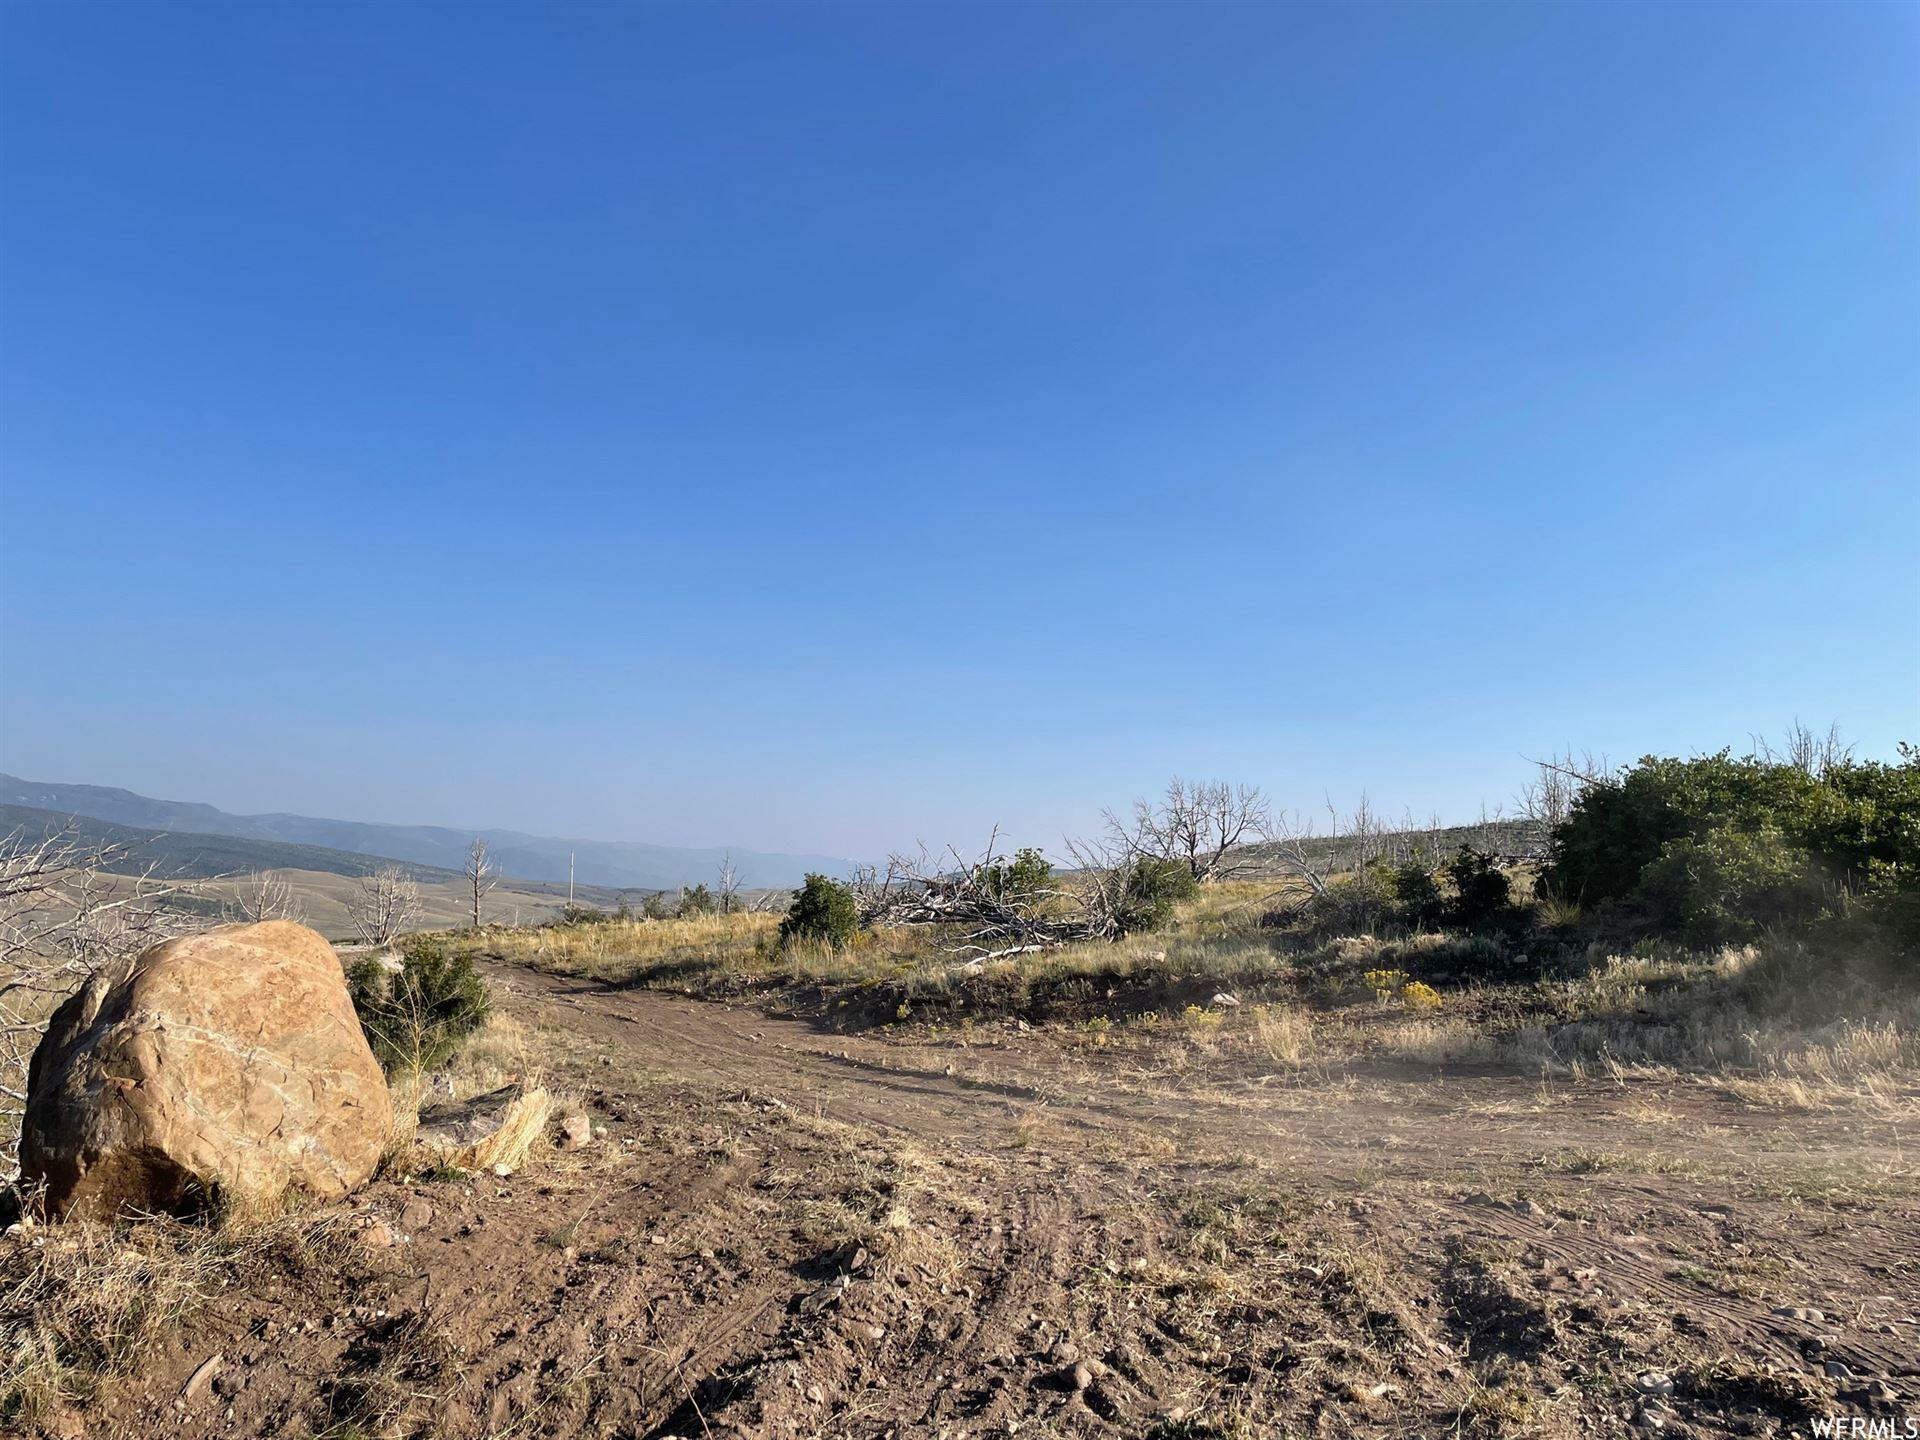 Photo of 14 J15, Indianola, UT 84629 (MLS # 1768489)